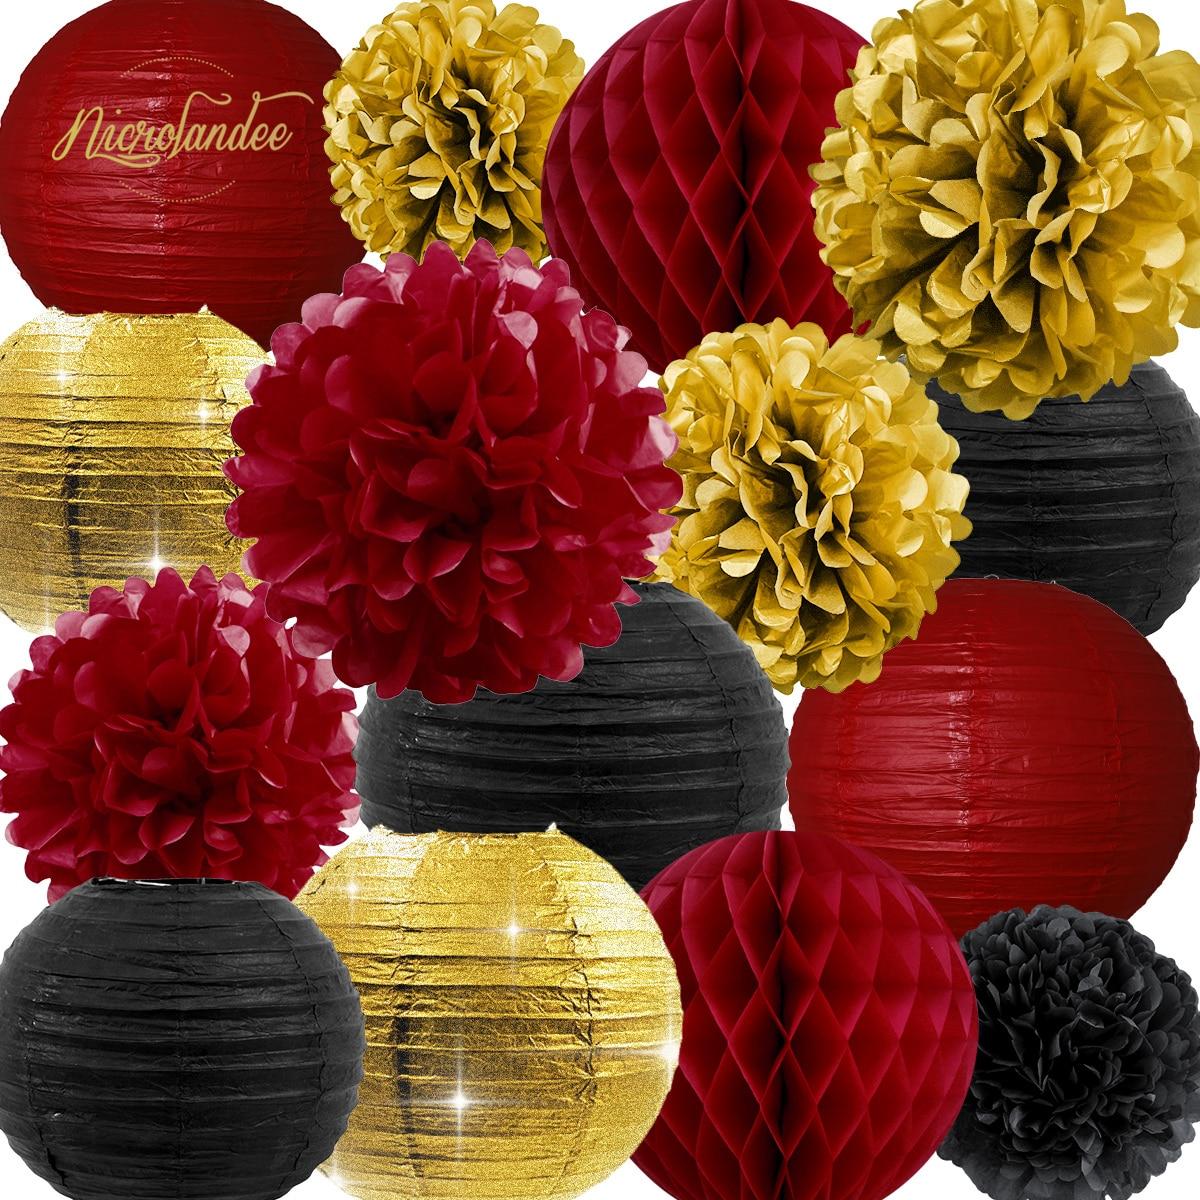 NICROLANDEE 15 pcs/set Red Black Gold Paper Lanterns Flowers Honeycomb Ball Birthday Hen Party Bride Shower Decoration DIY